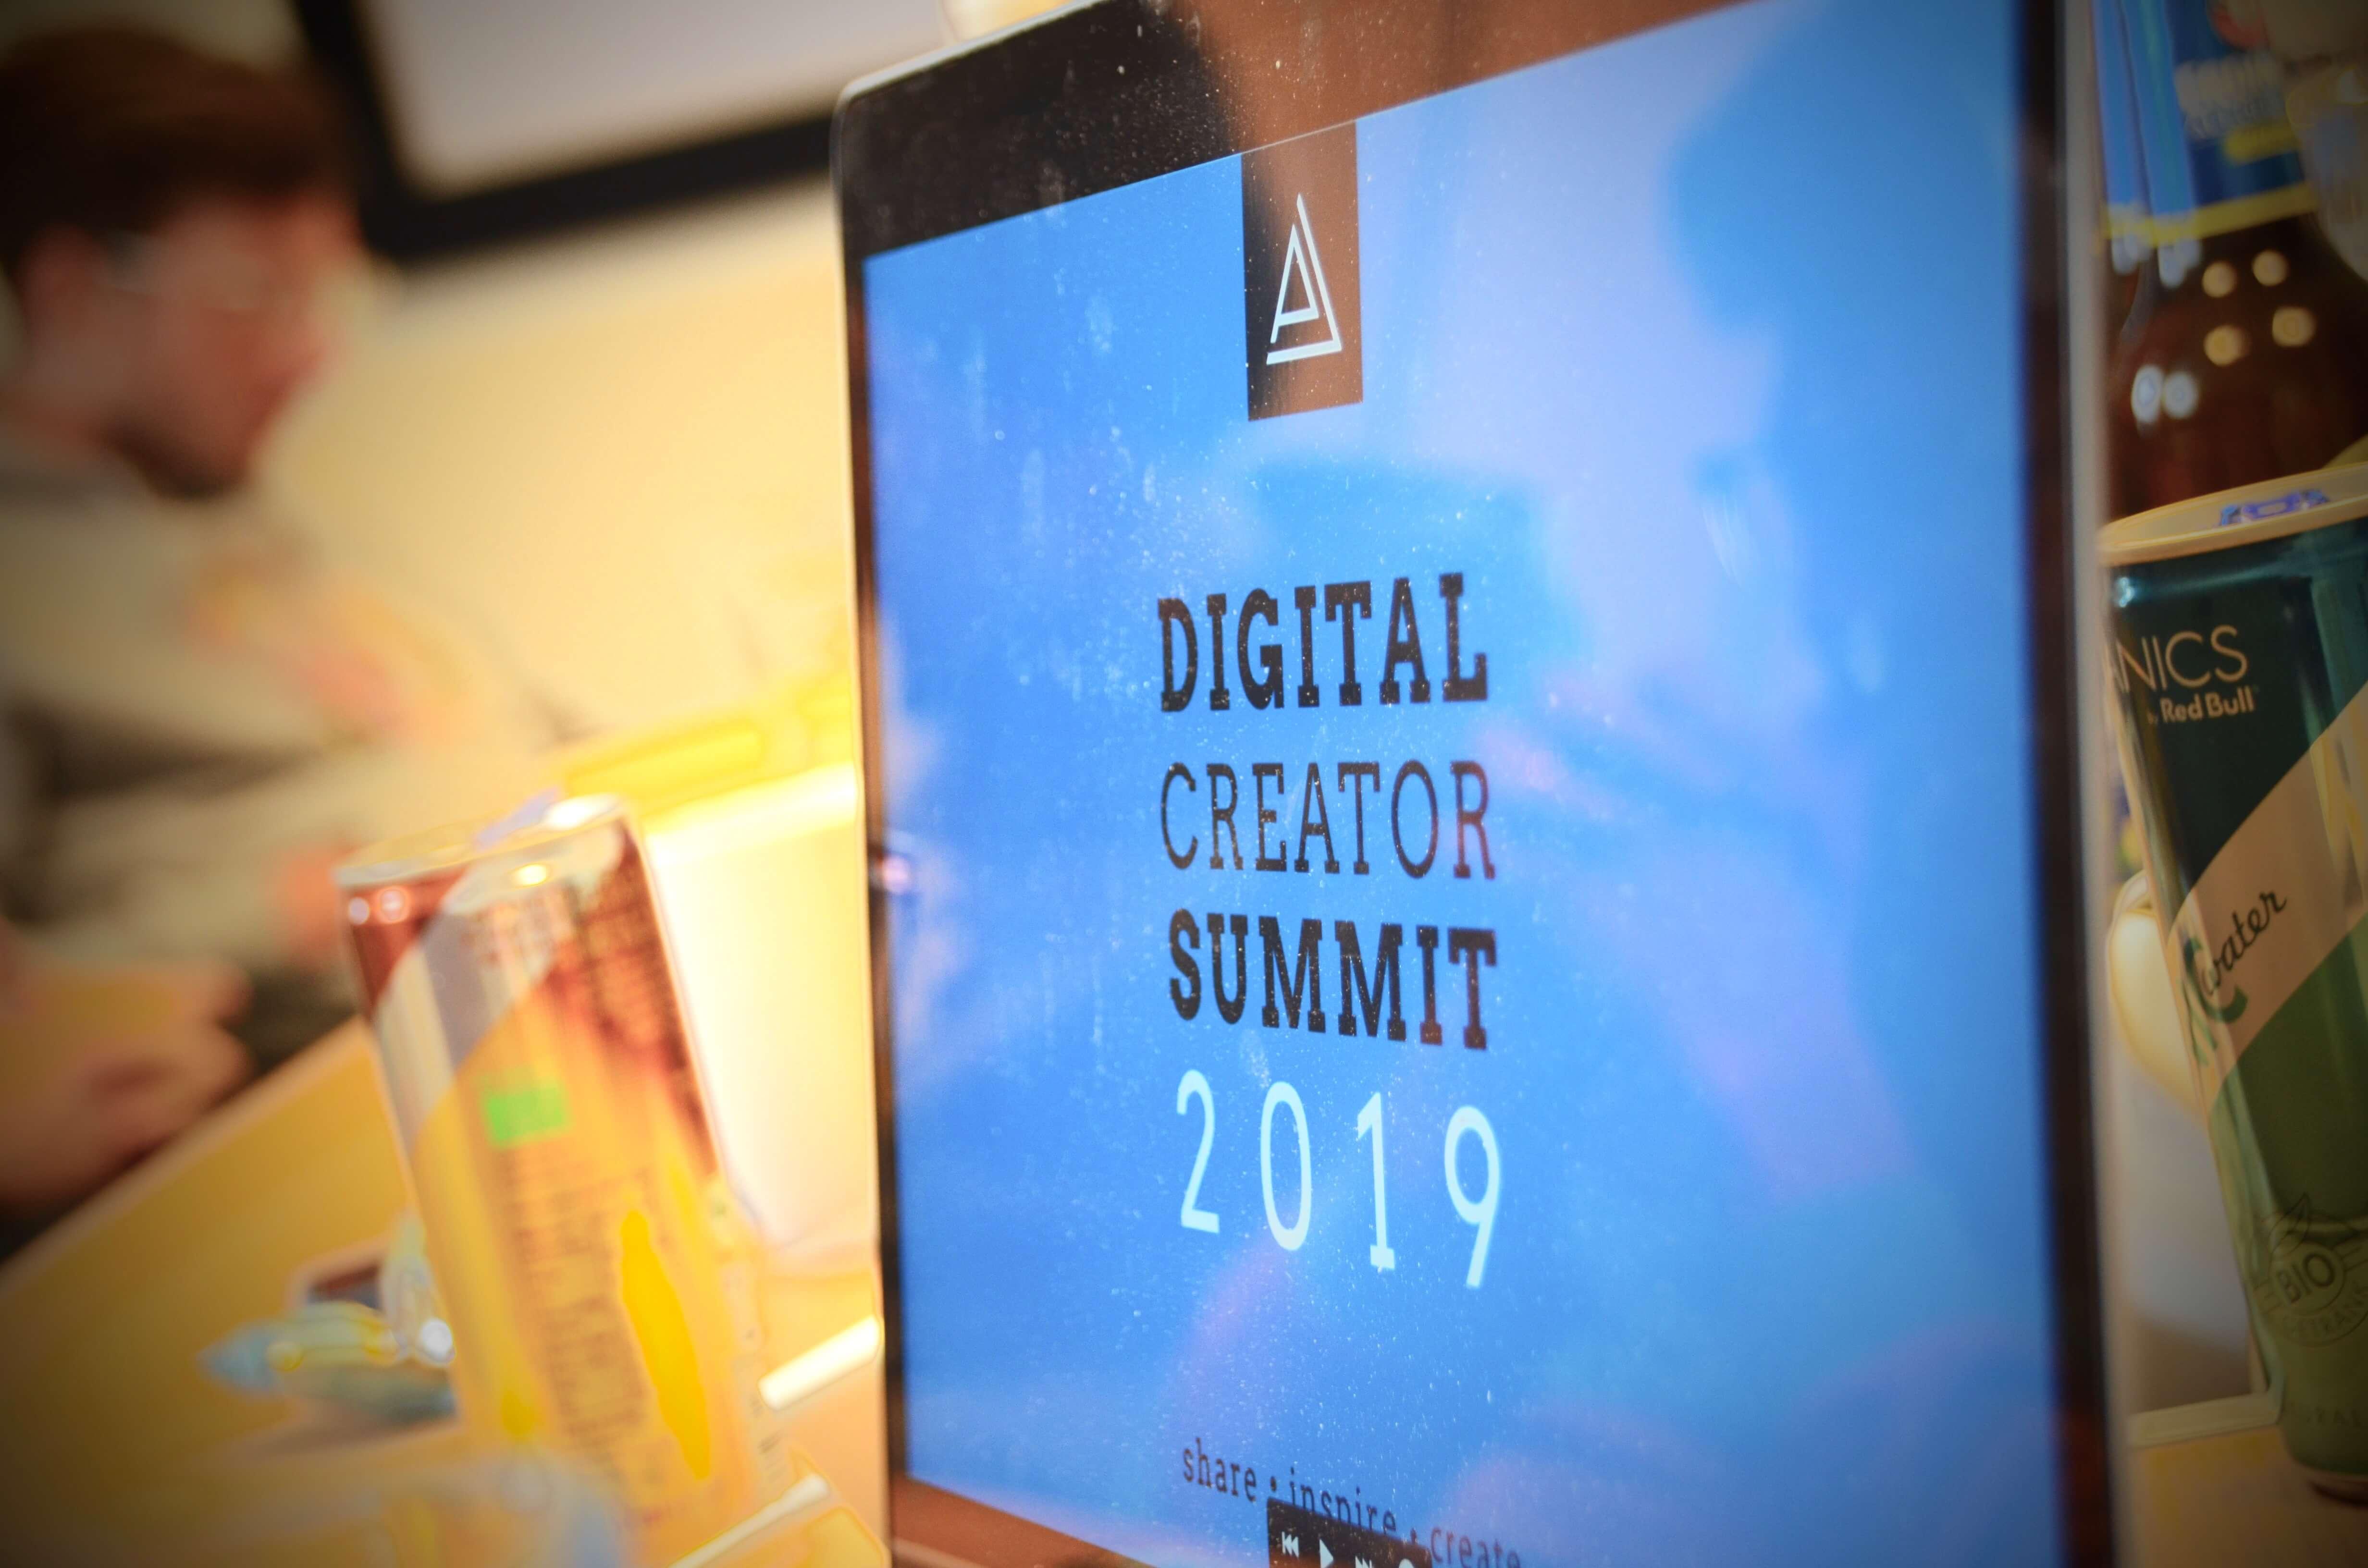 Pushing-Limits-Digital-Creator-Summit